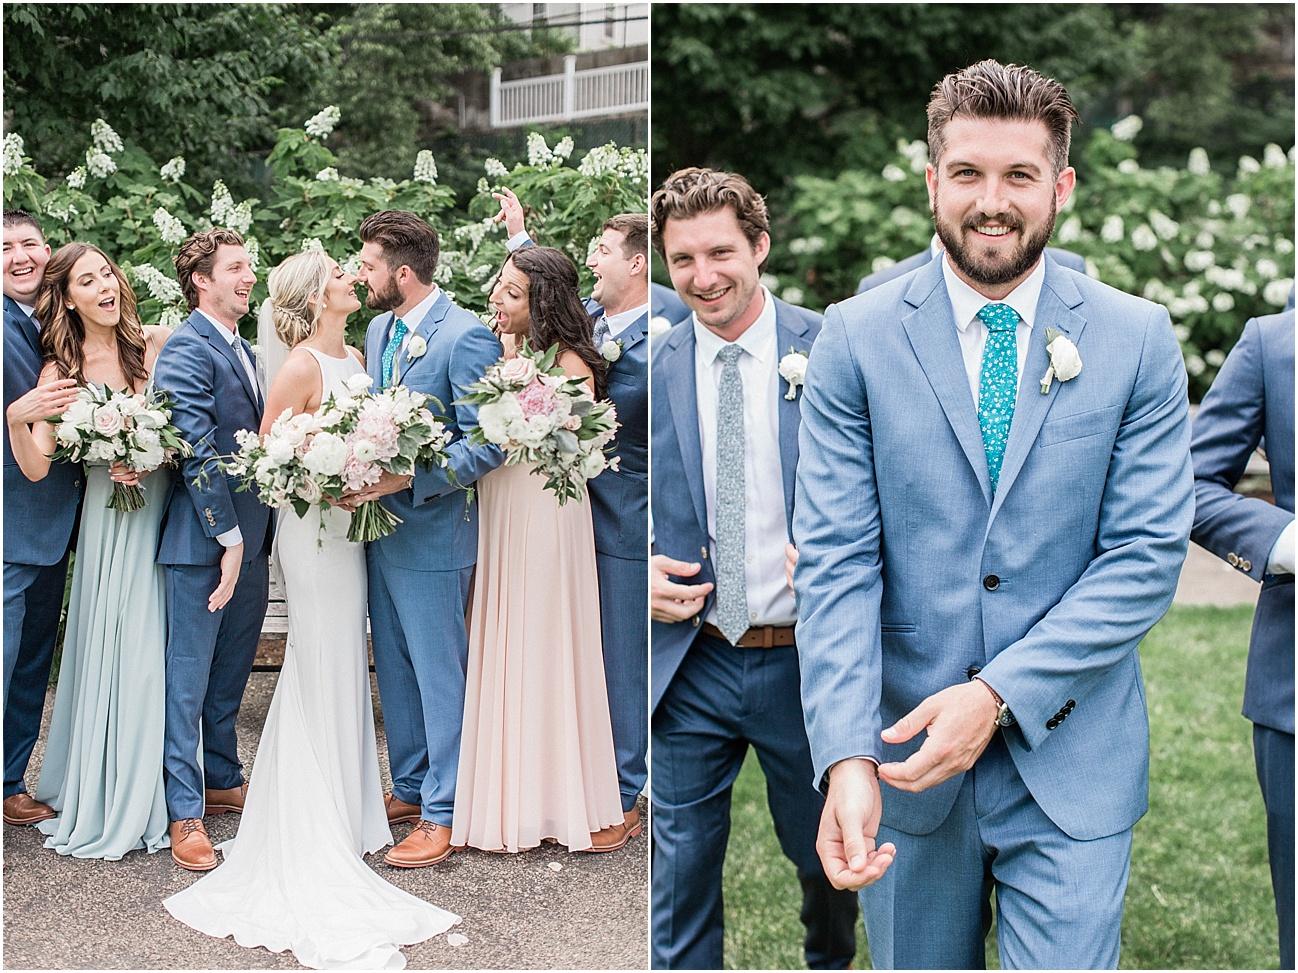 lindsey_paul_indian_pond_country_club_wild_dahlia_brewster_gardens_plymouth_cape_cod_boston_wedding_photographer_meredith_jane_photography_photo_0382.jpg